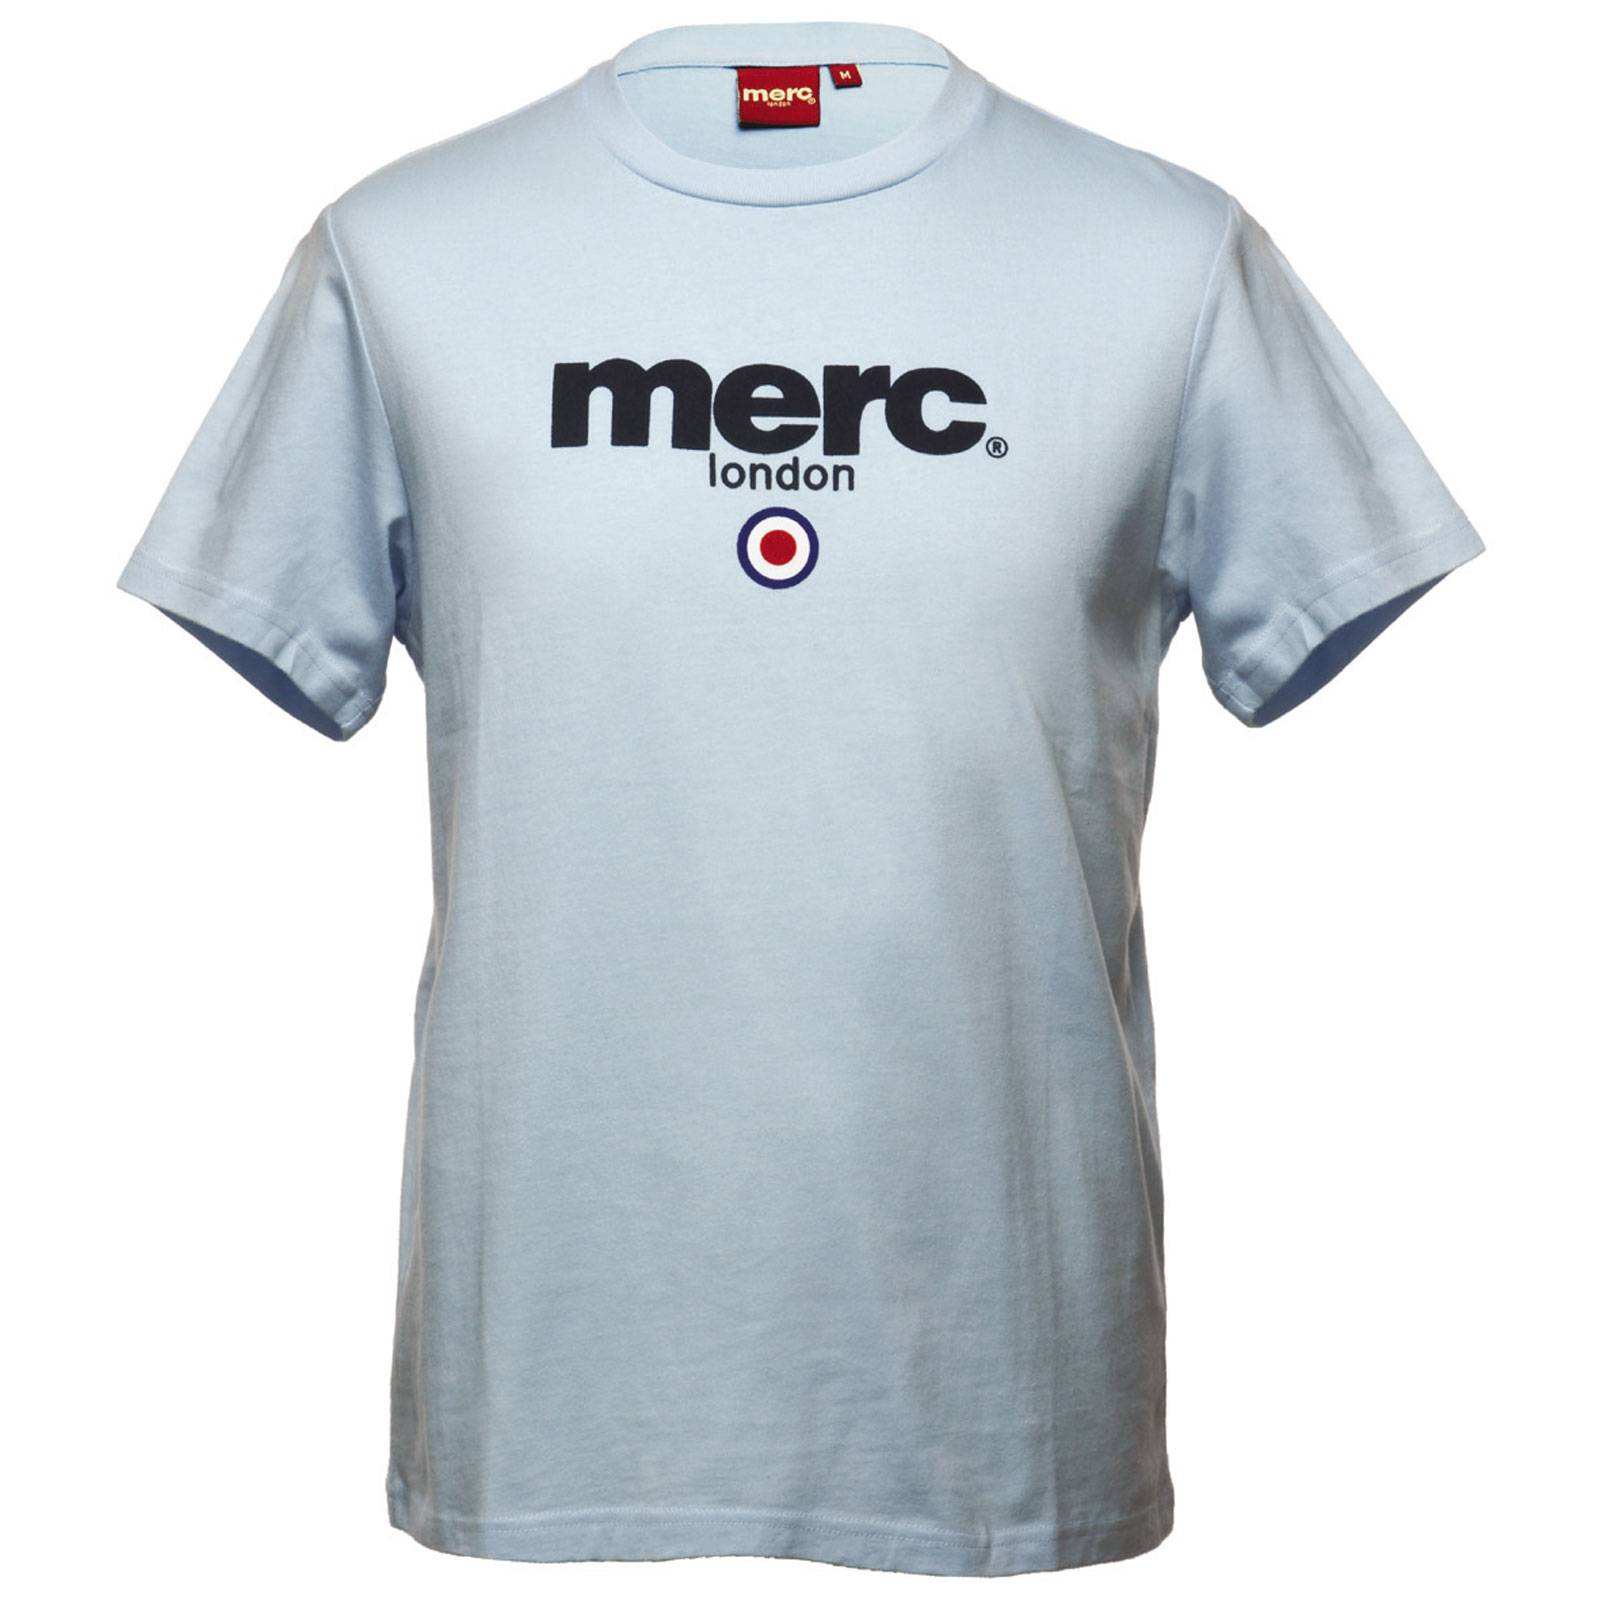 Merc London Футболка Brighton • 1704136